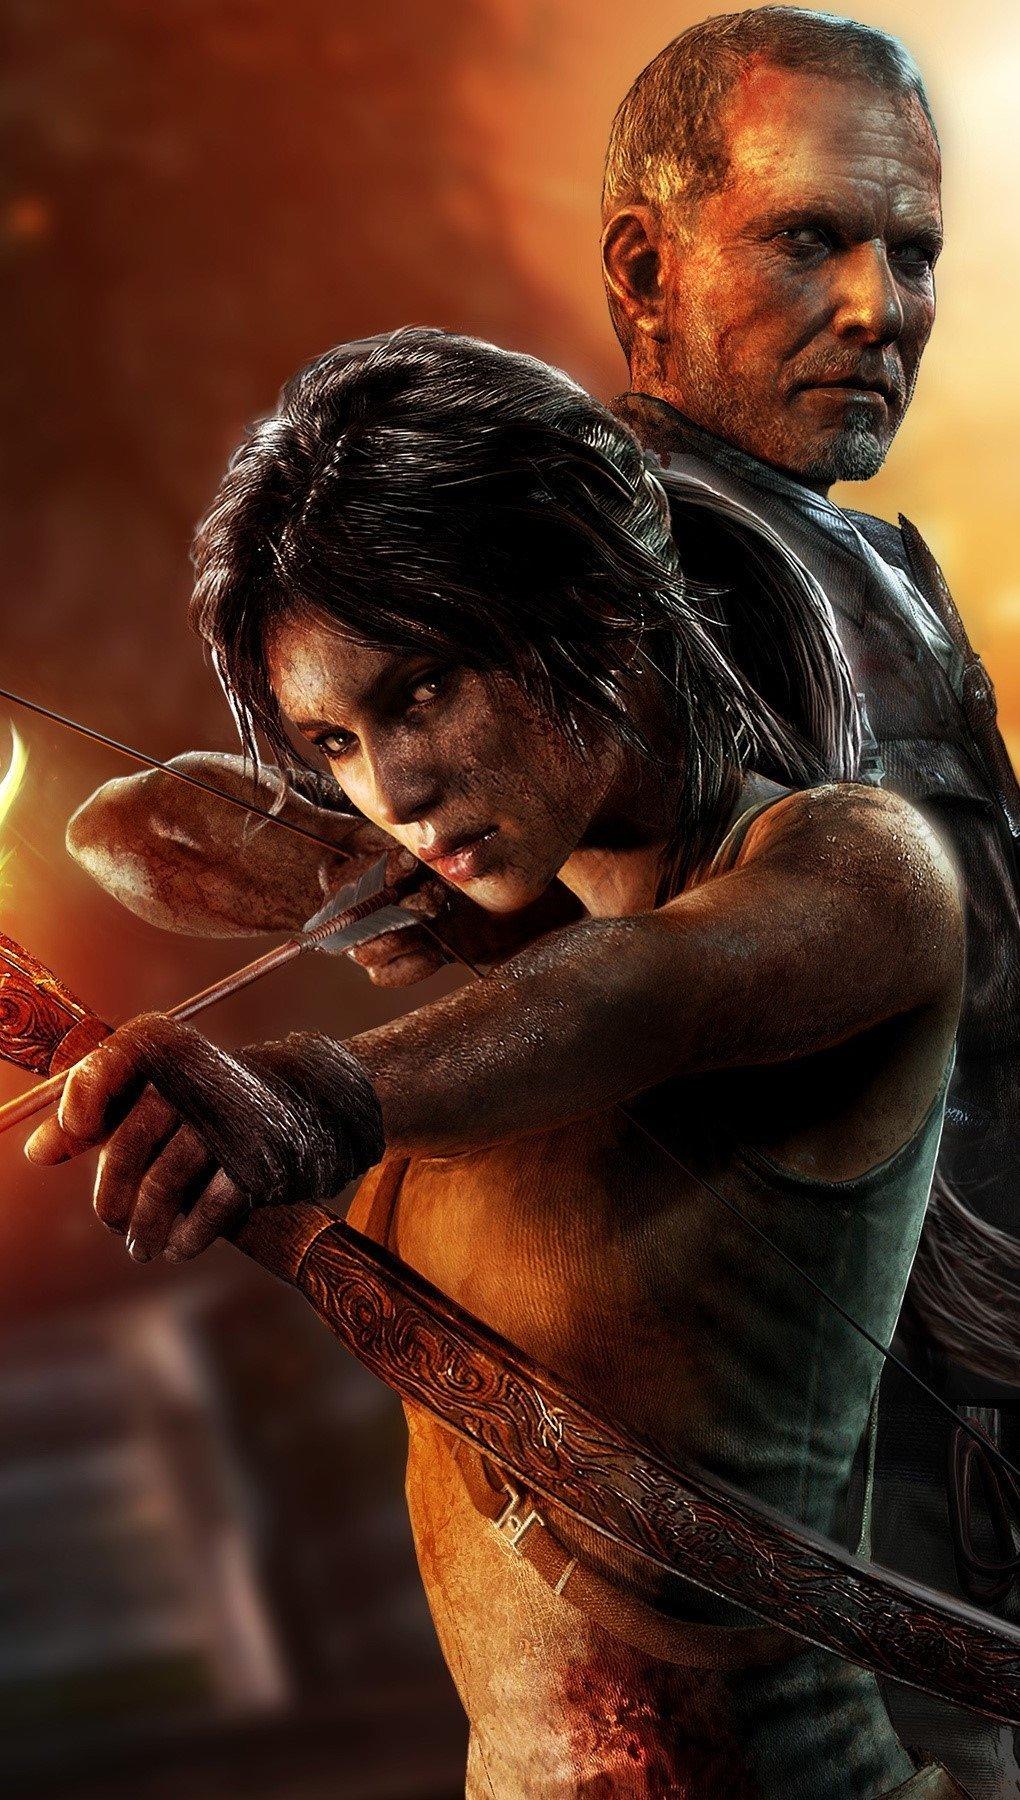 Wallpaper Tomb Raider Vertical